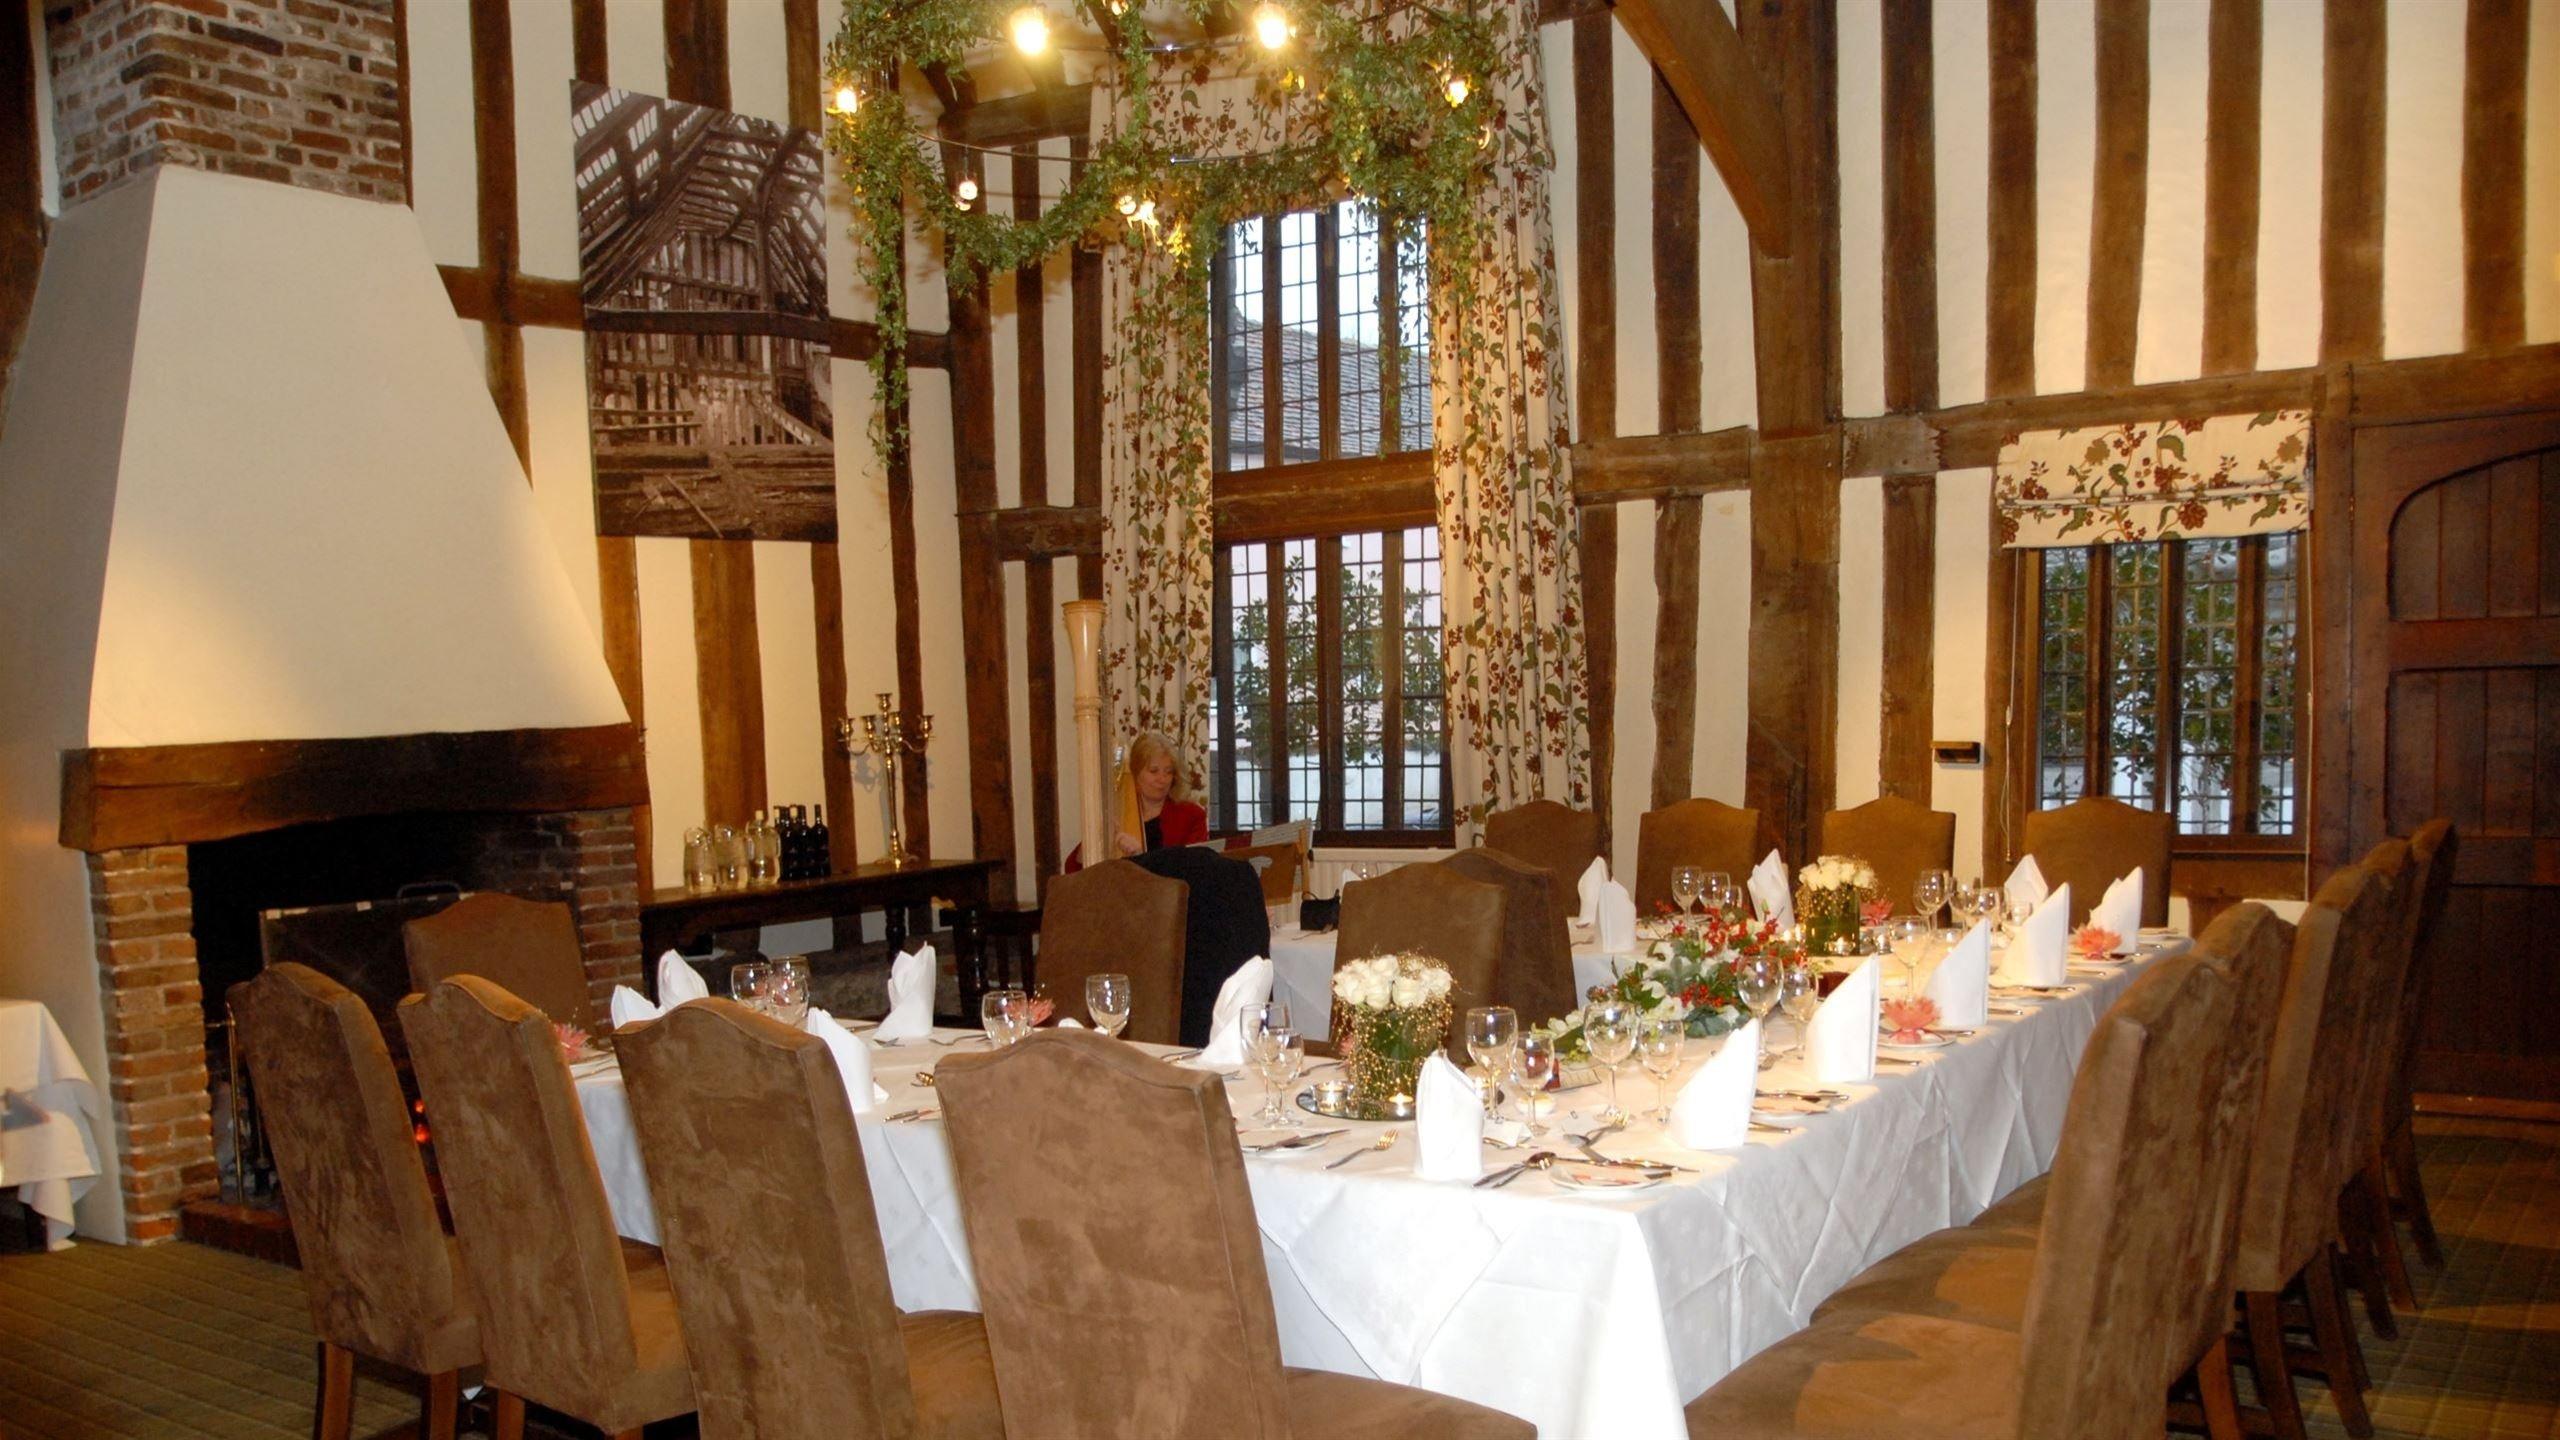 10 Gorgeous Cheap Wedding Ideas For Winter cheap wedding ideas for winter wedding ideas uxjj 1